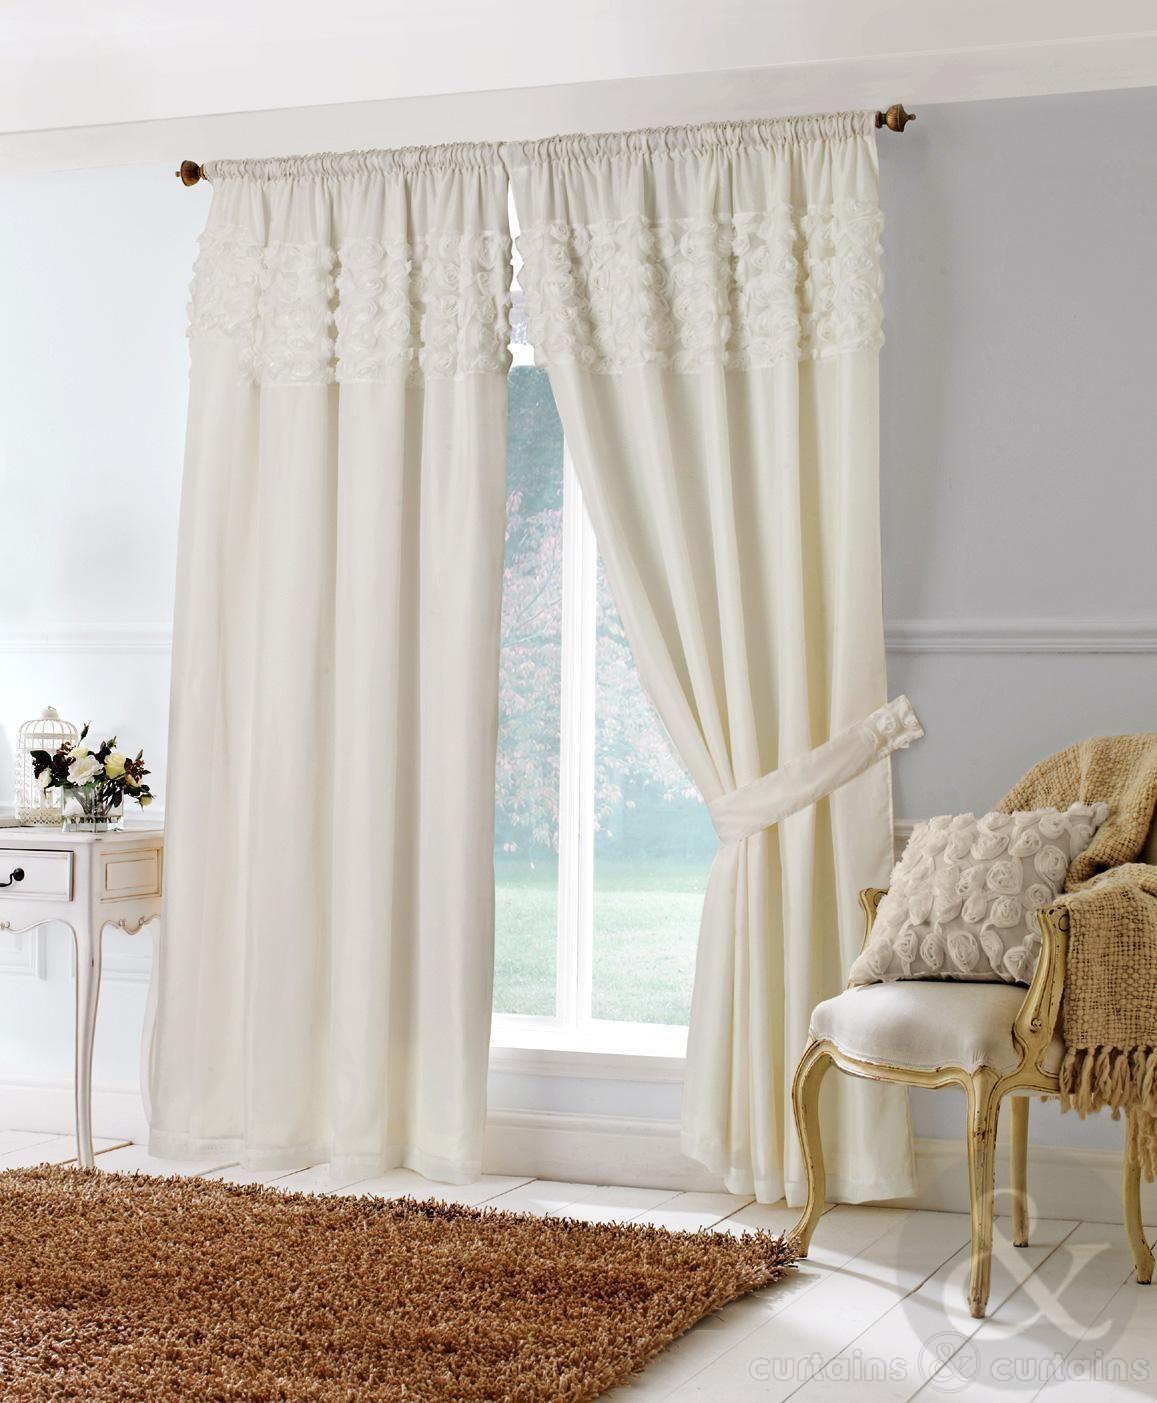 Bedroom Curtains Design Beautiful Bedroom Curtains Designs  Bedroom Furniture  Pinterest